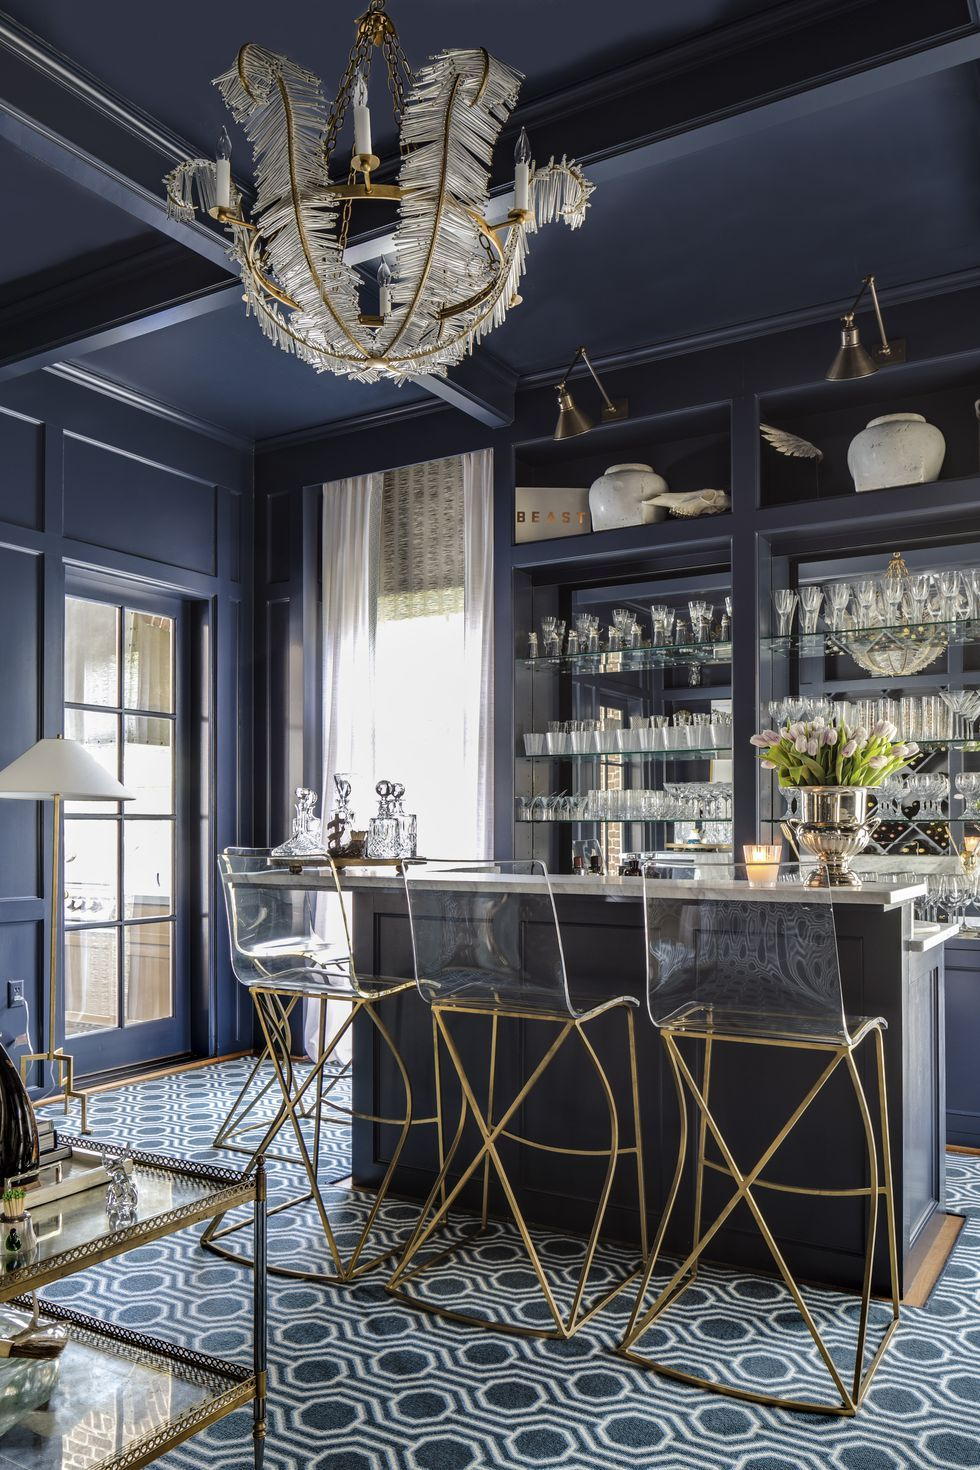 20 Glorious Contemporary Home Bar Designs You Ll Go Crazy For: Modern Home Bar Designs, Modern Home Bar, Home